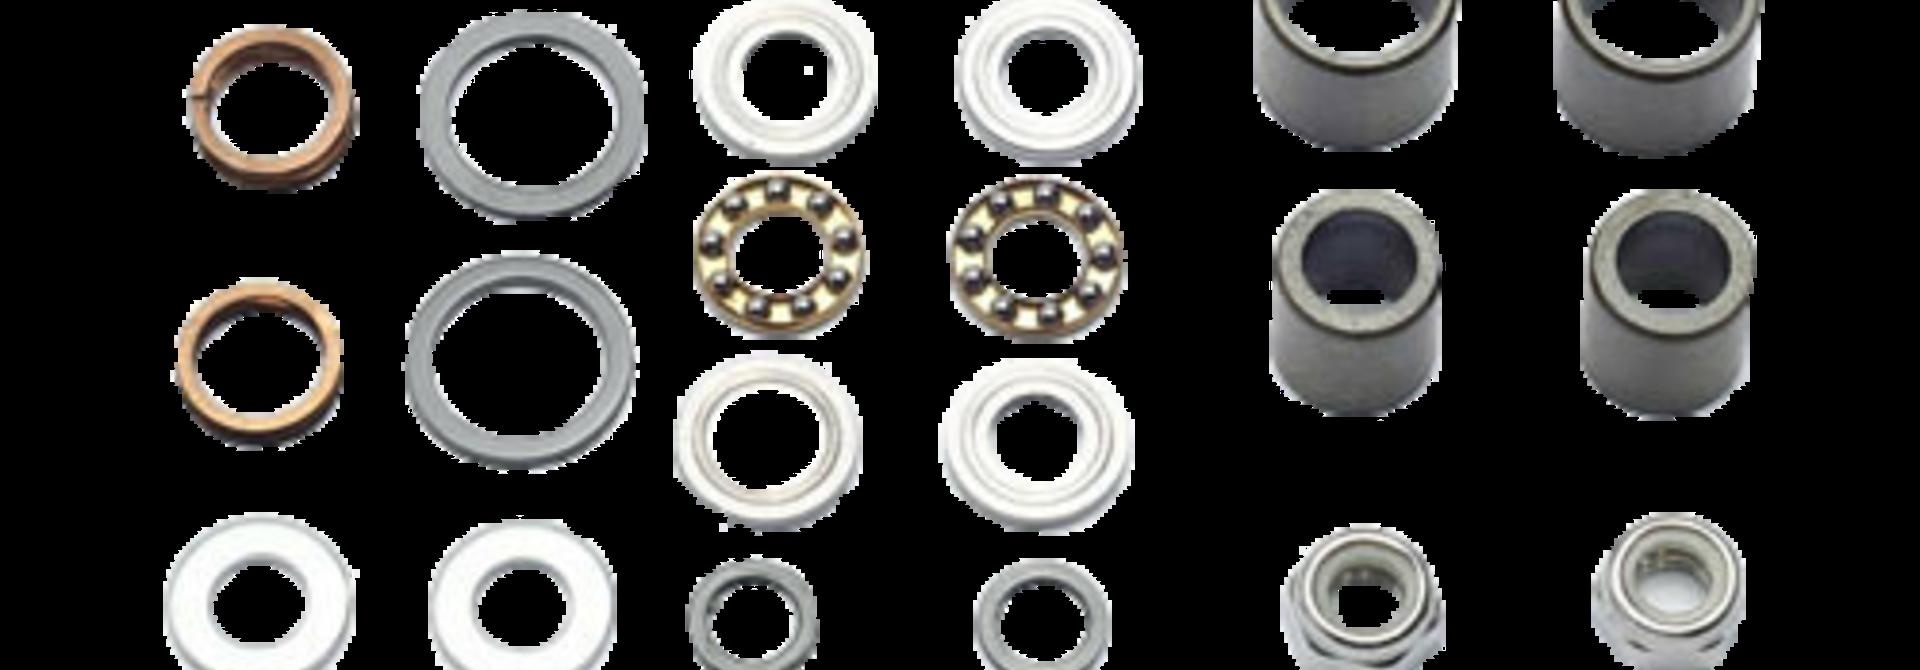 HT Rebuild Kit T1 / M1 2016 (GEN 1 & 2)